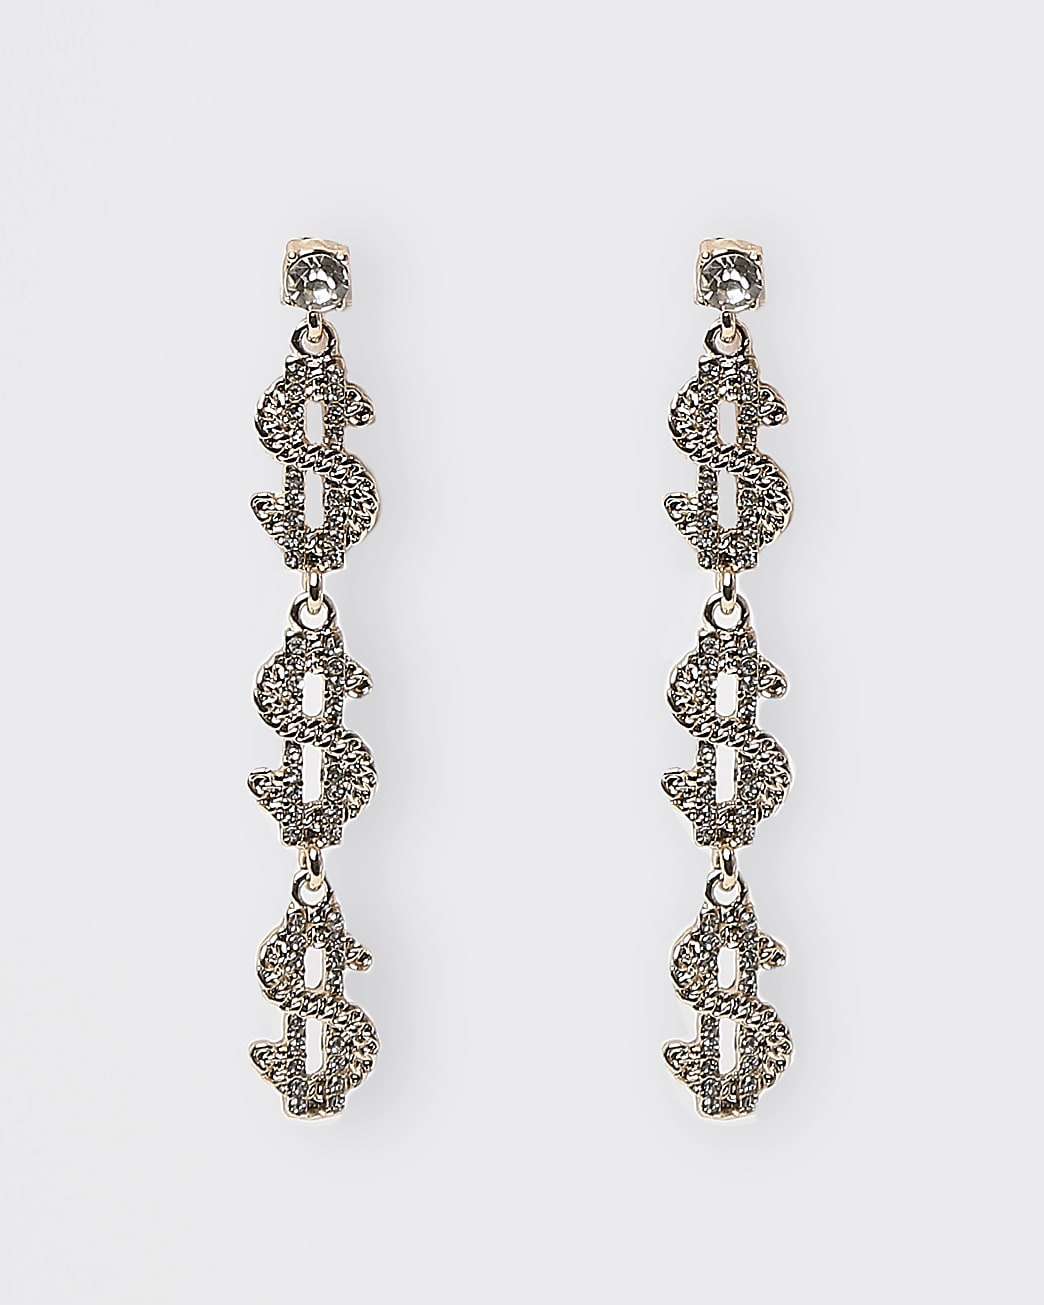 Gold dollar sign pendant drop earrings